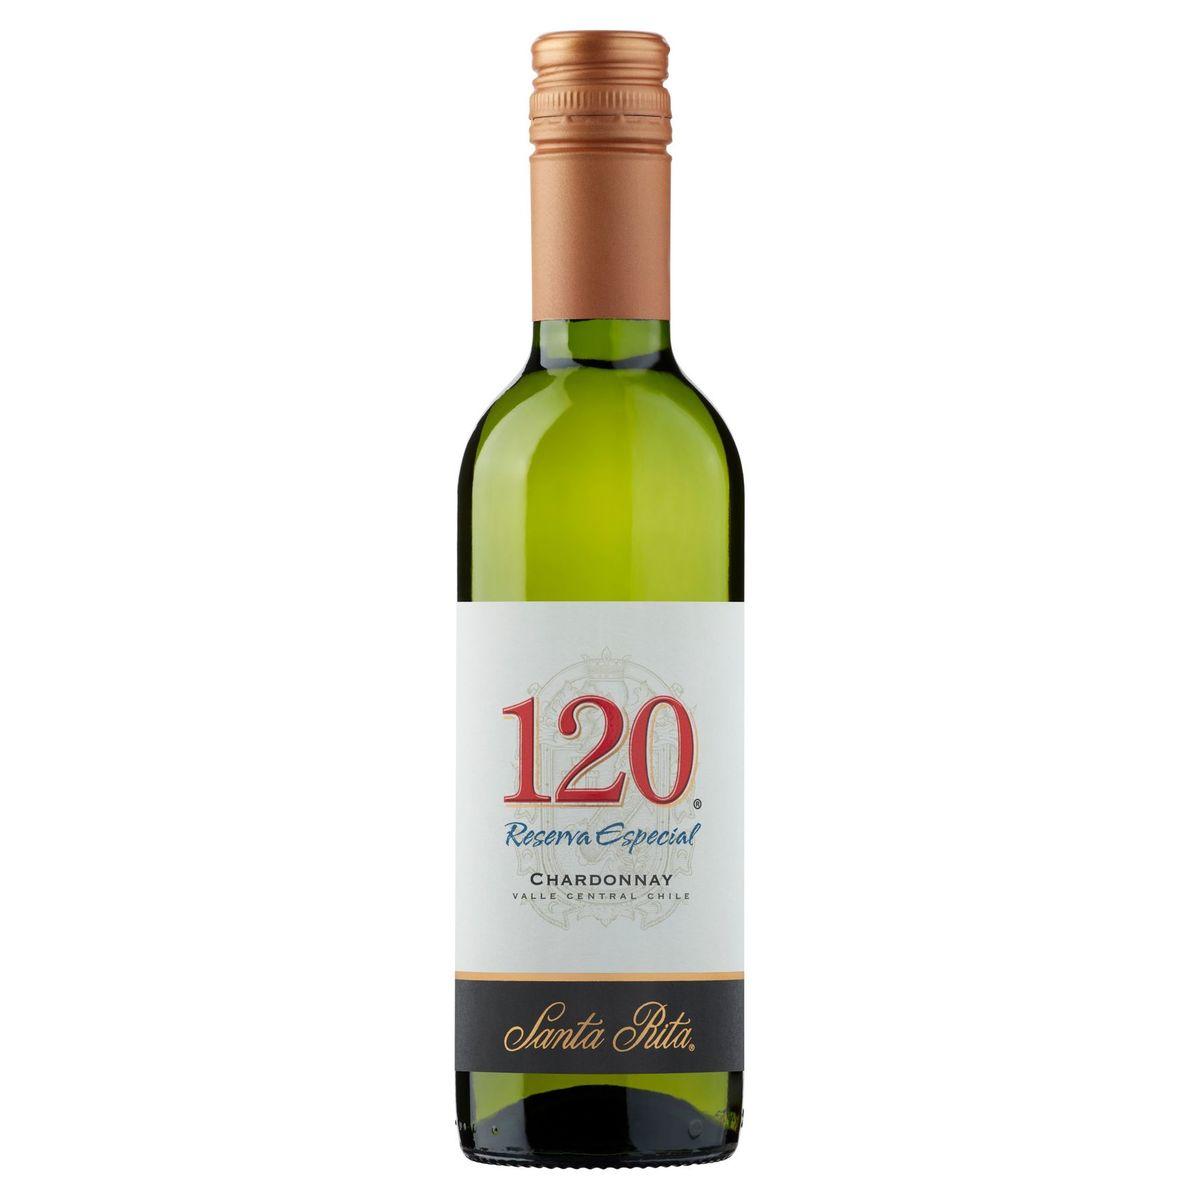 Santa Rita 120 Reserva Especial Chardonnay 375 ml